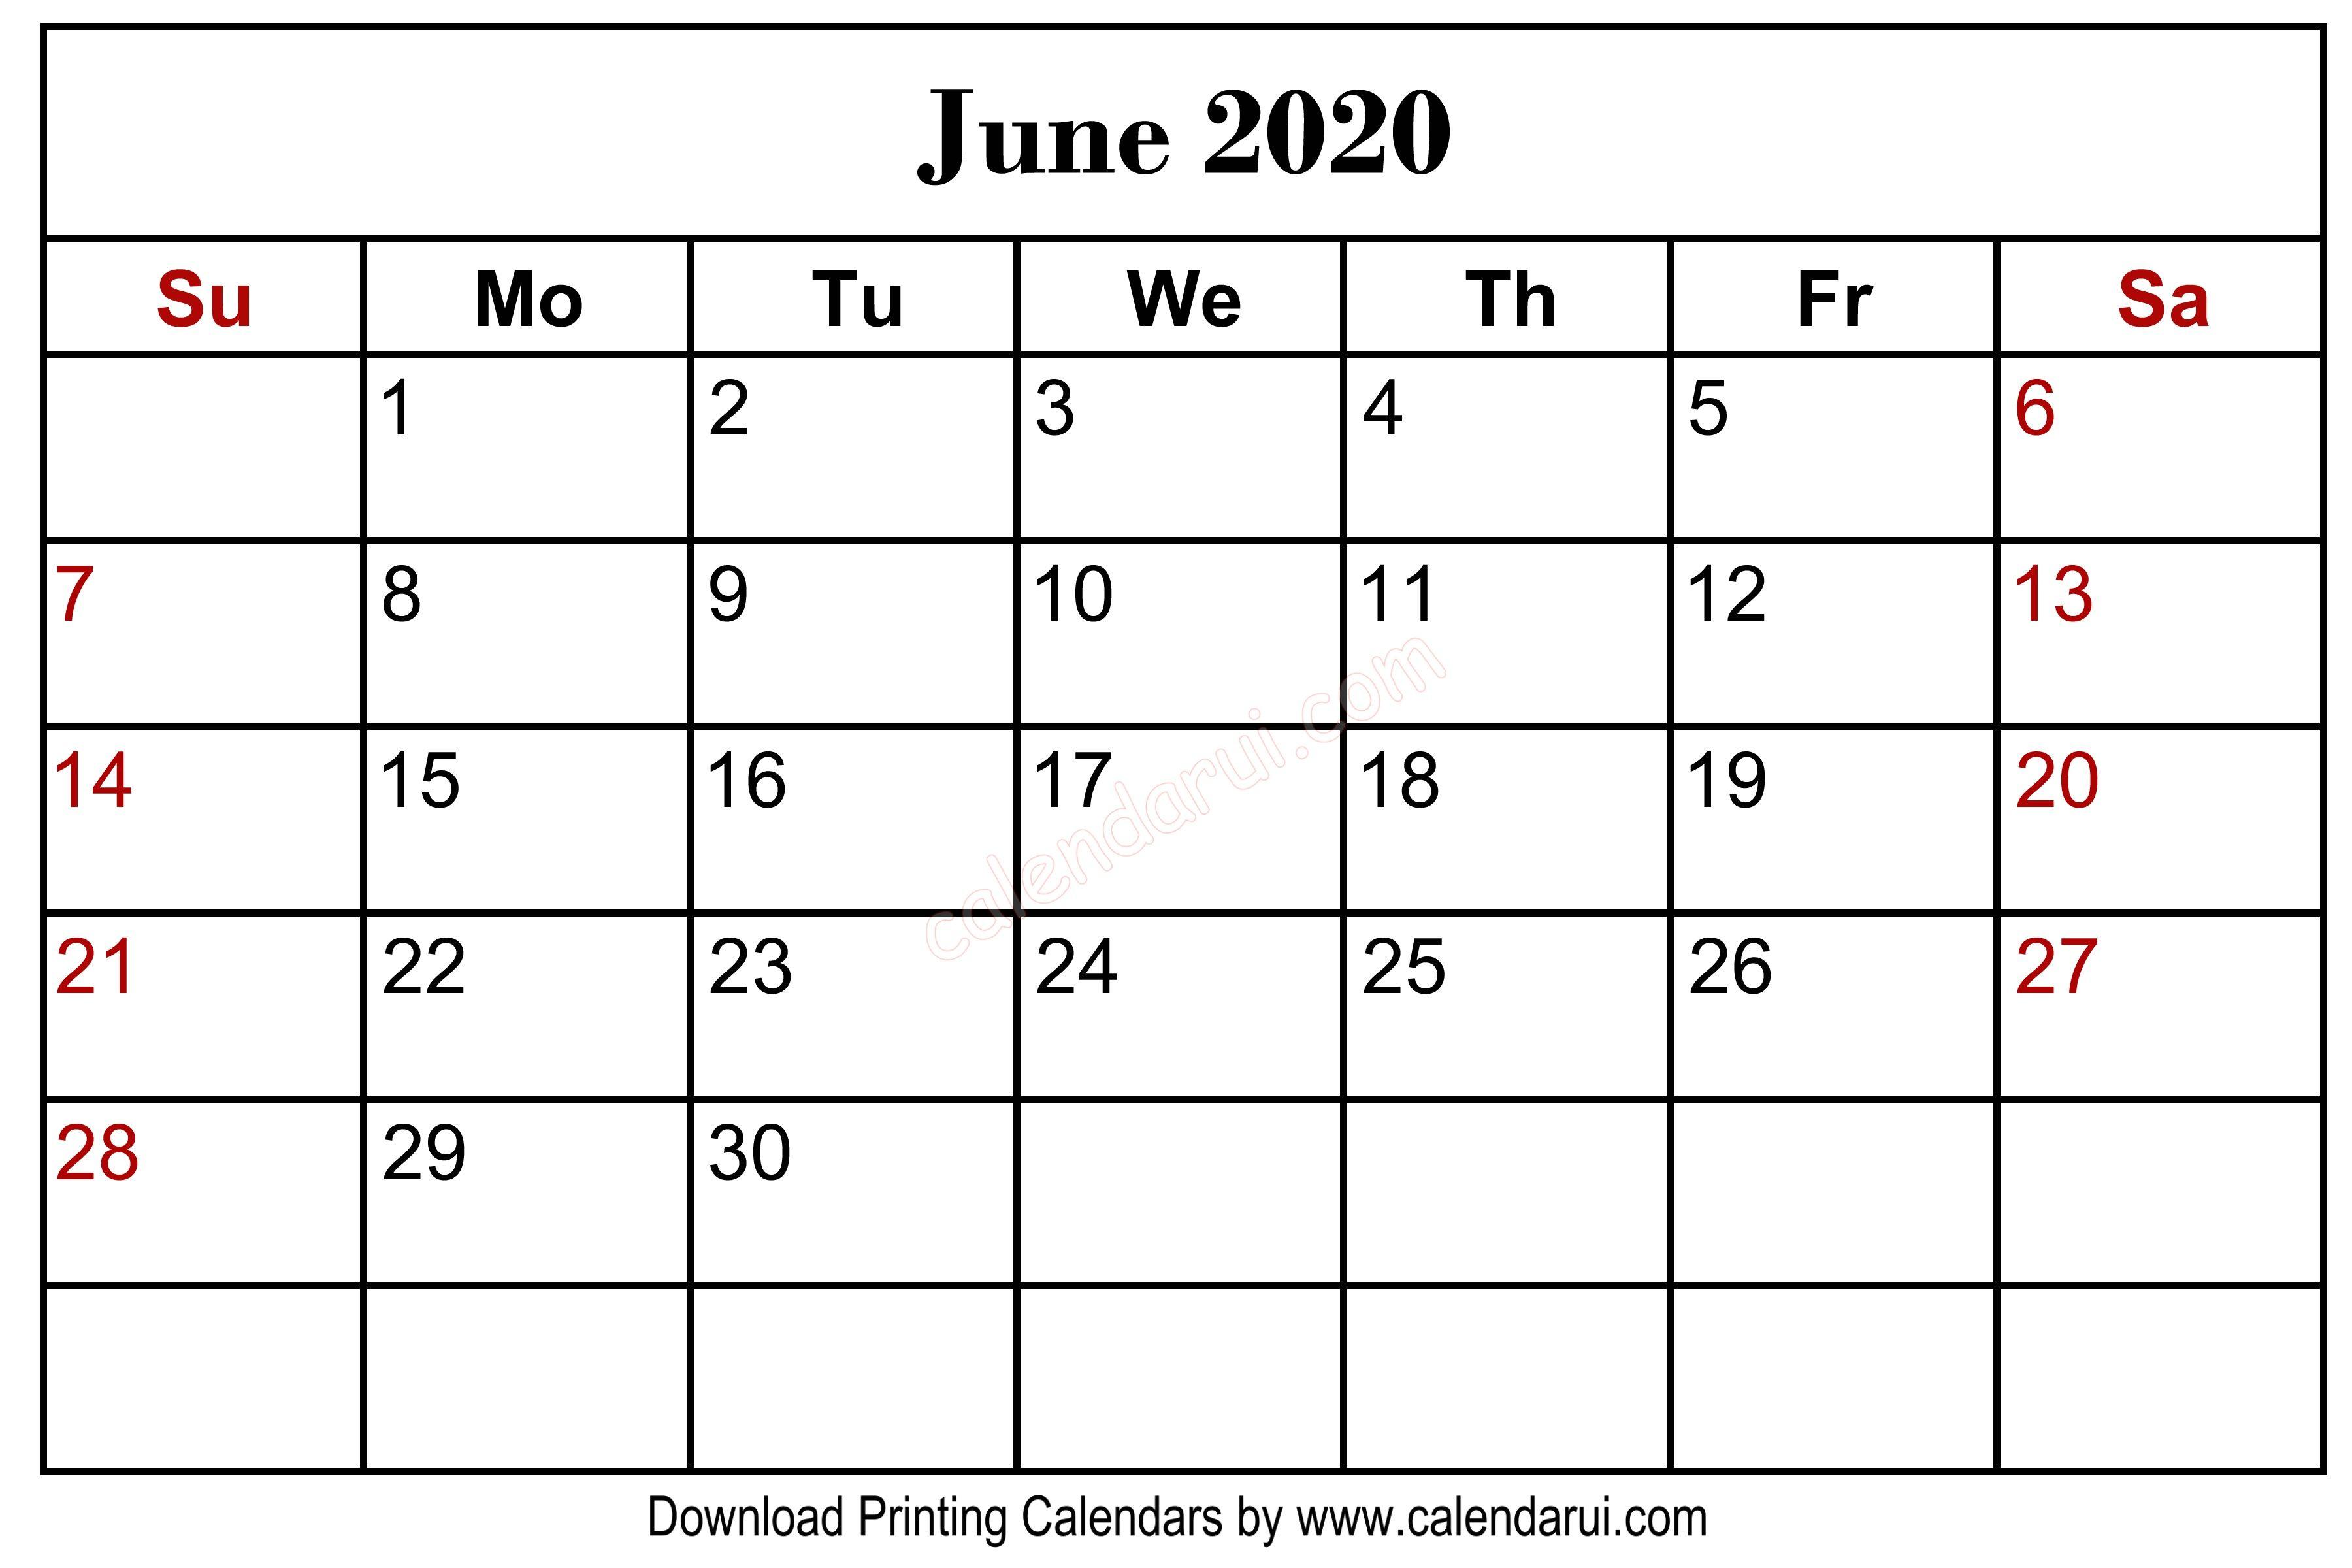 Homepage / 2020 Calendar / June 2020 Blank Calendar